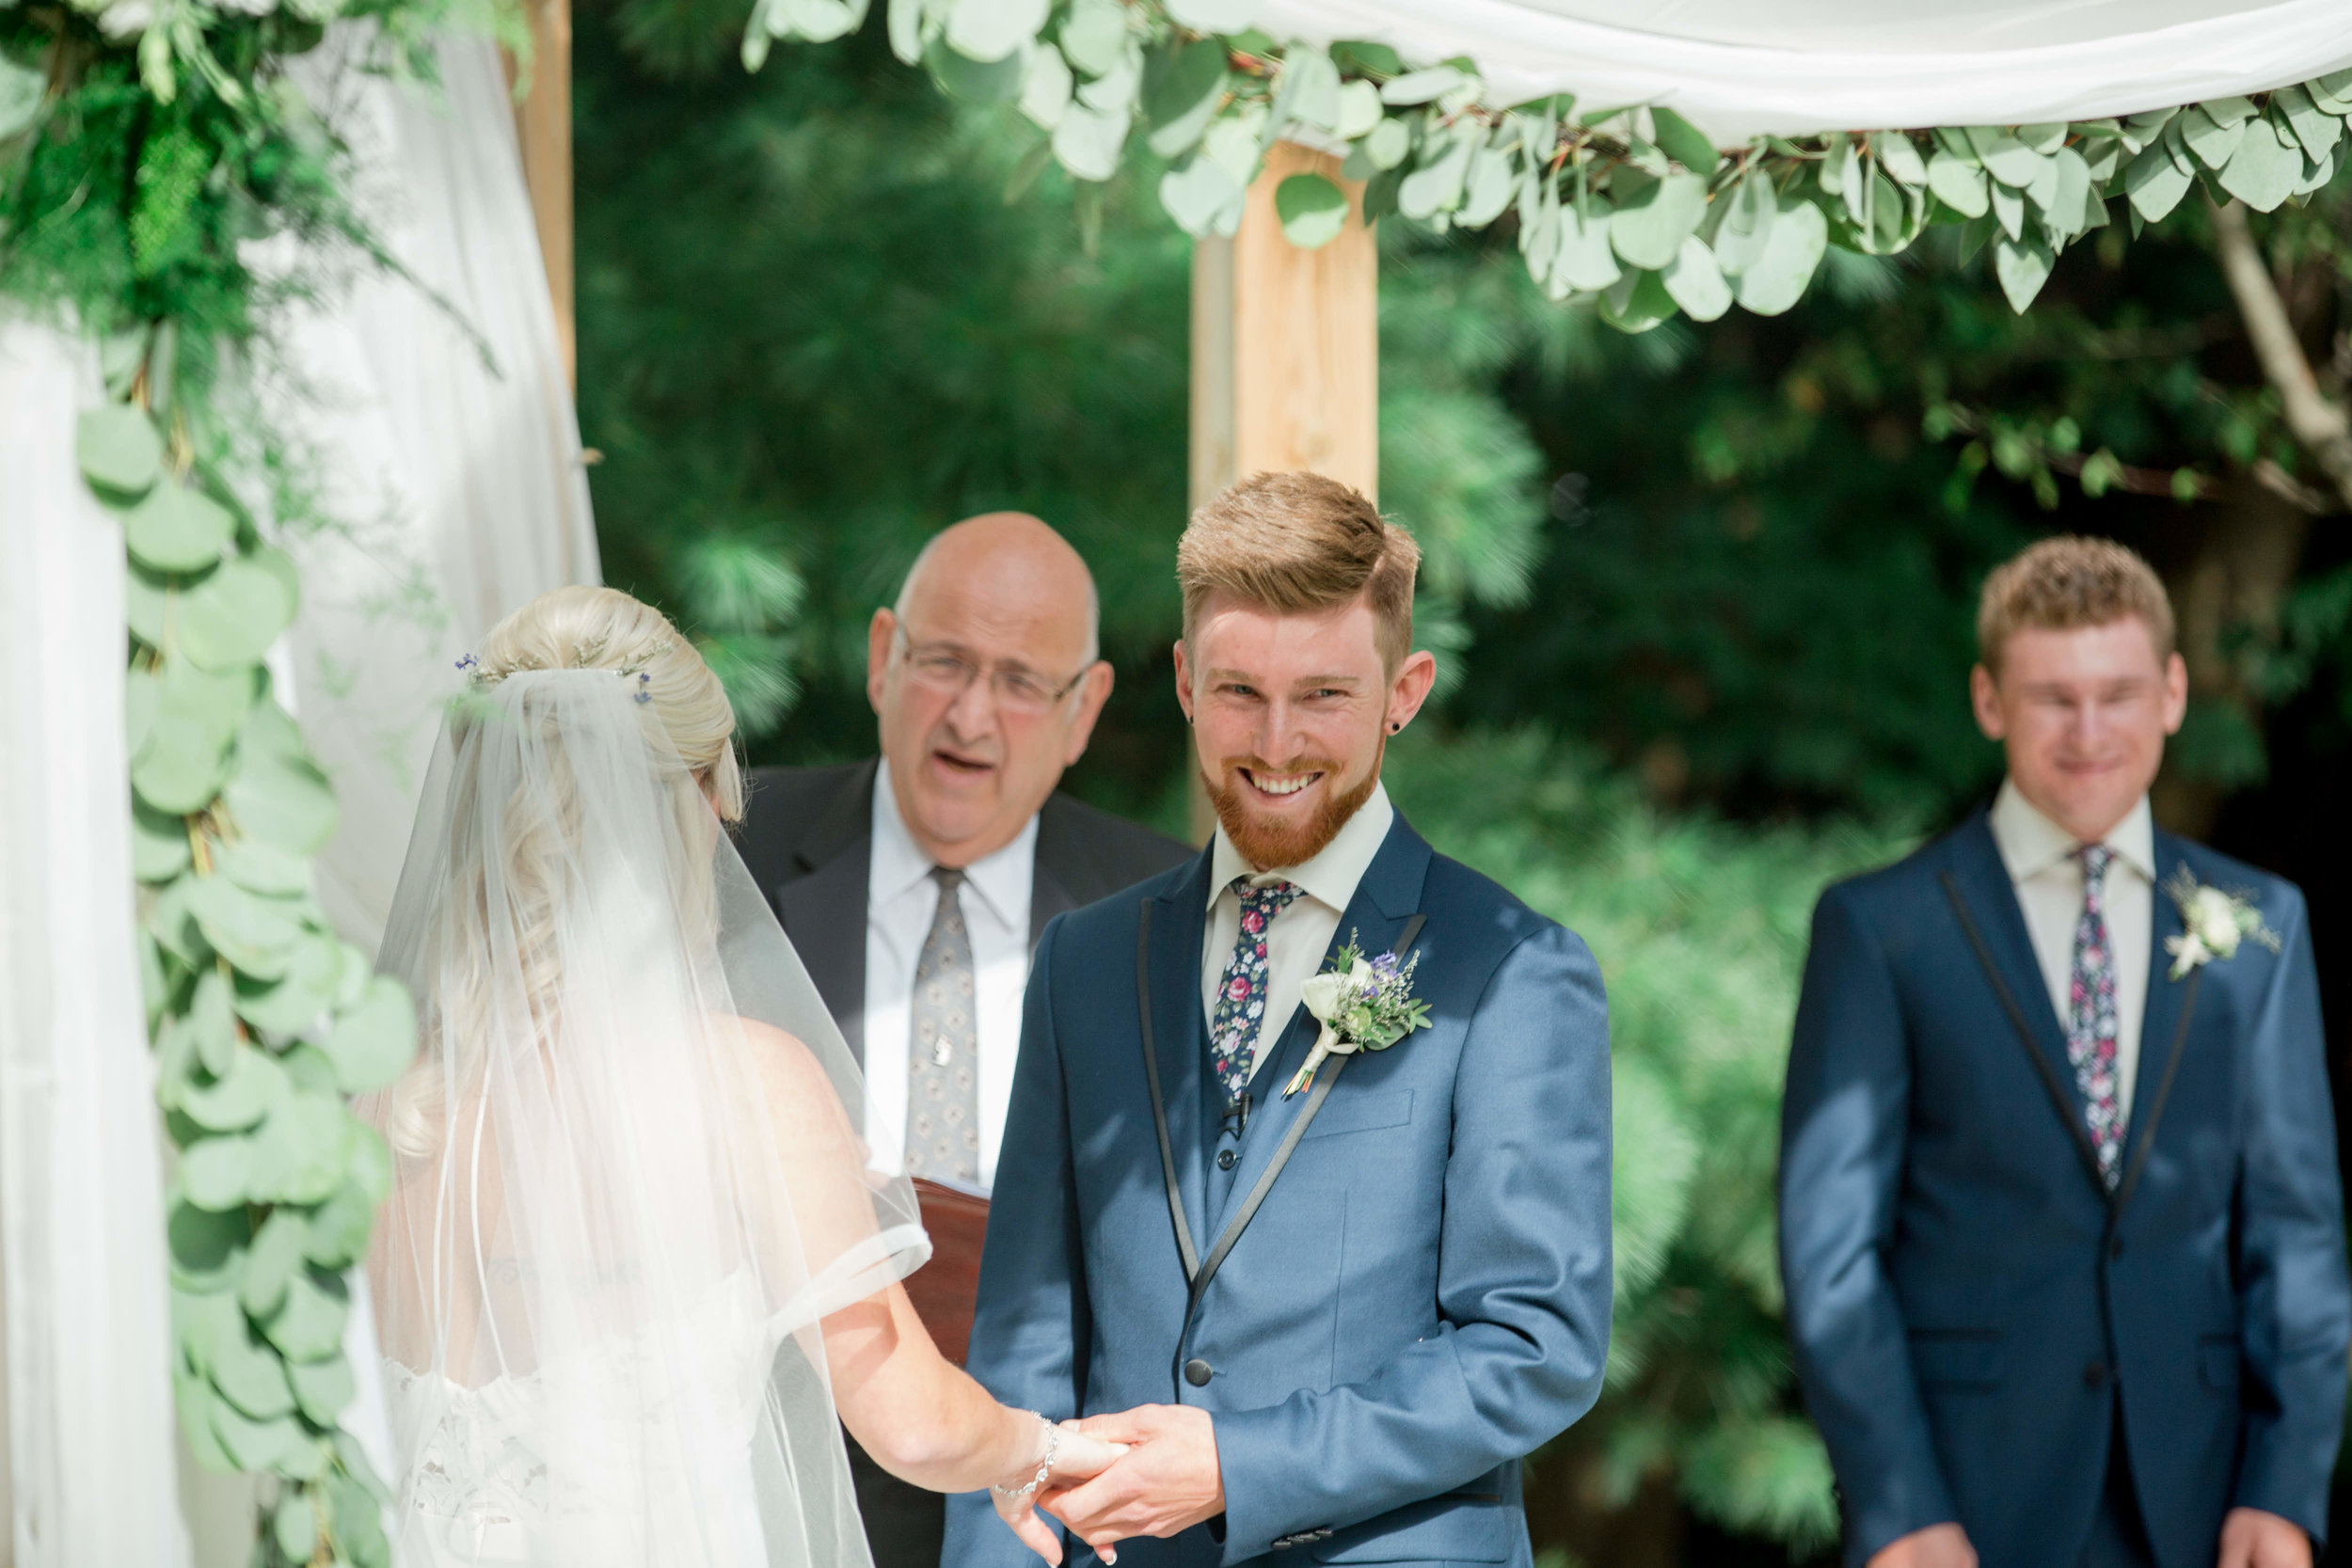 Maddy___Brandon___Daniel_Ricci_Weddings_High_Res._Finals_283.jpg